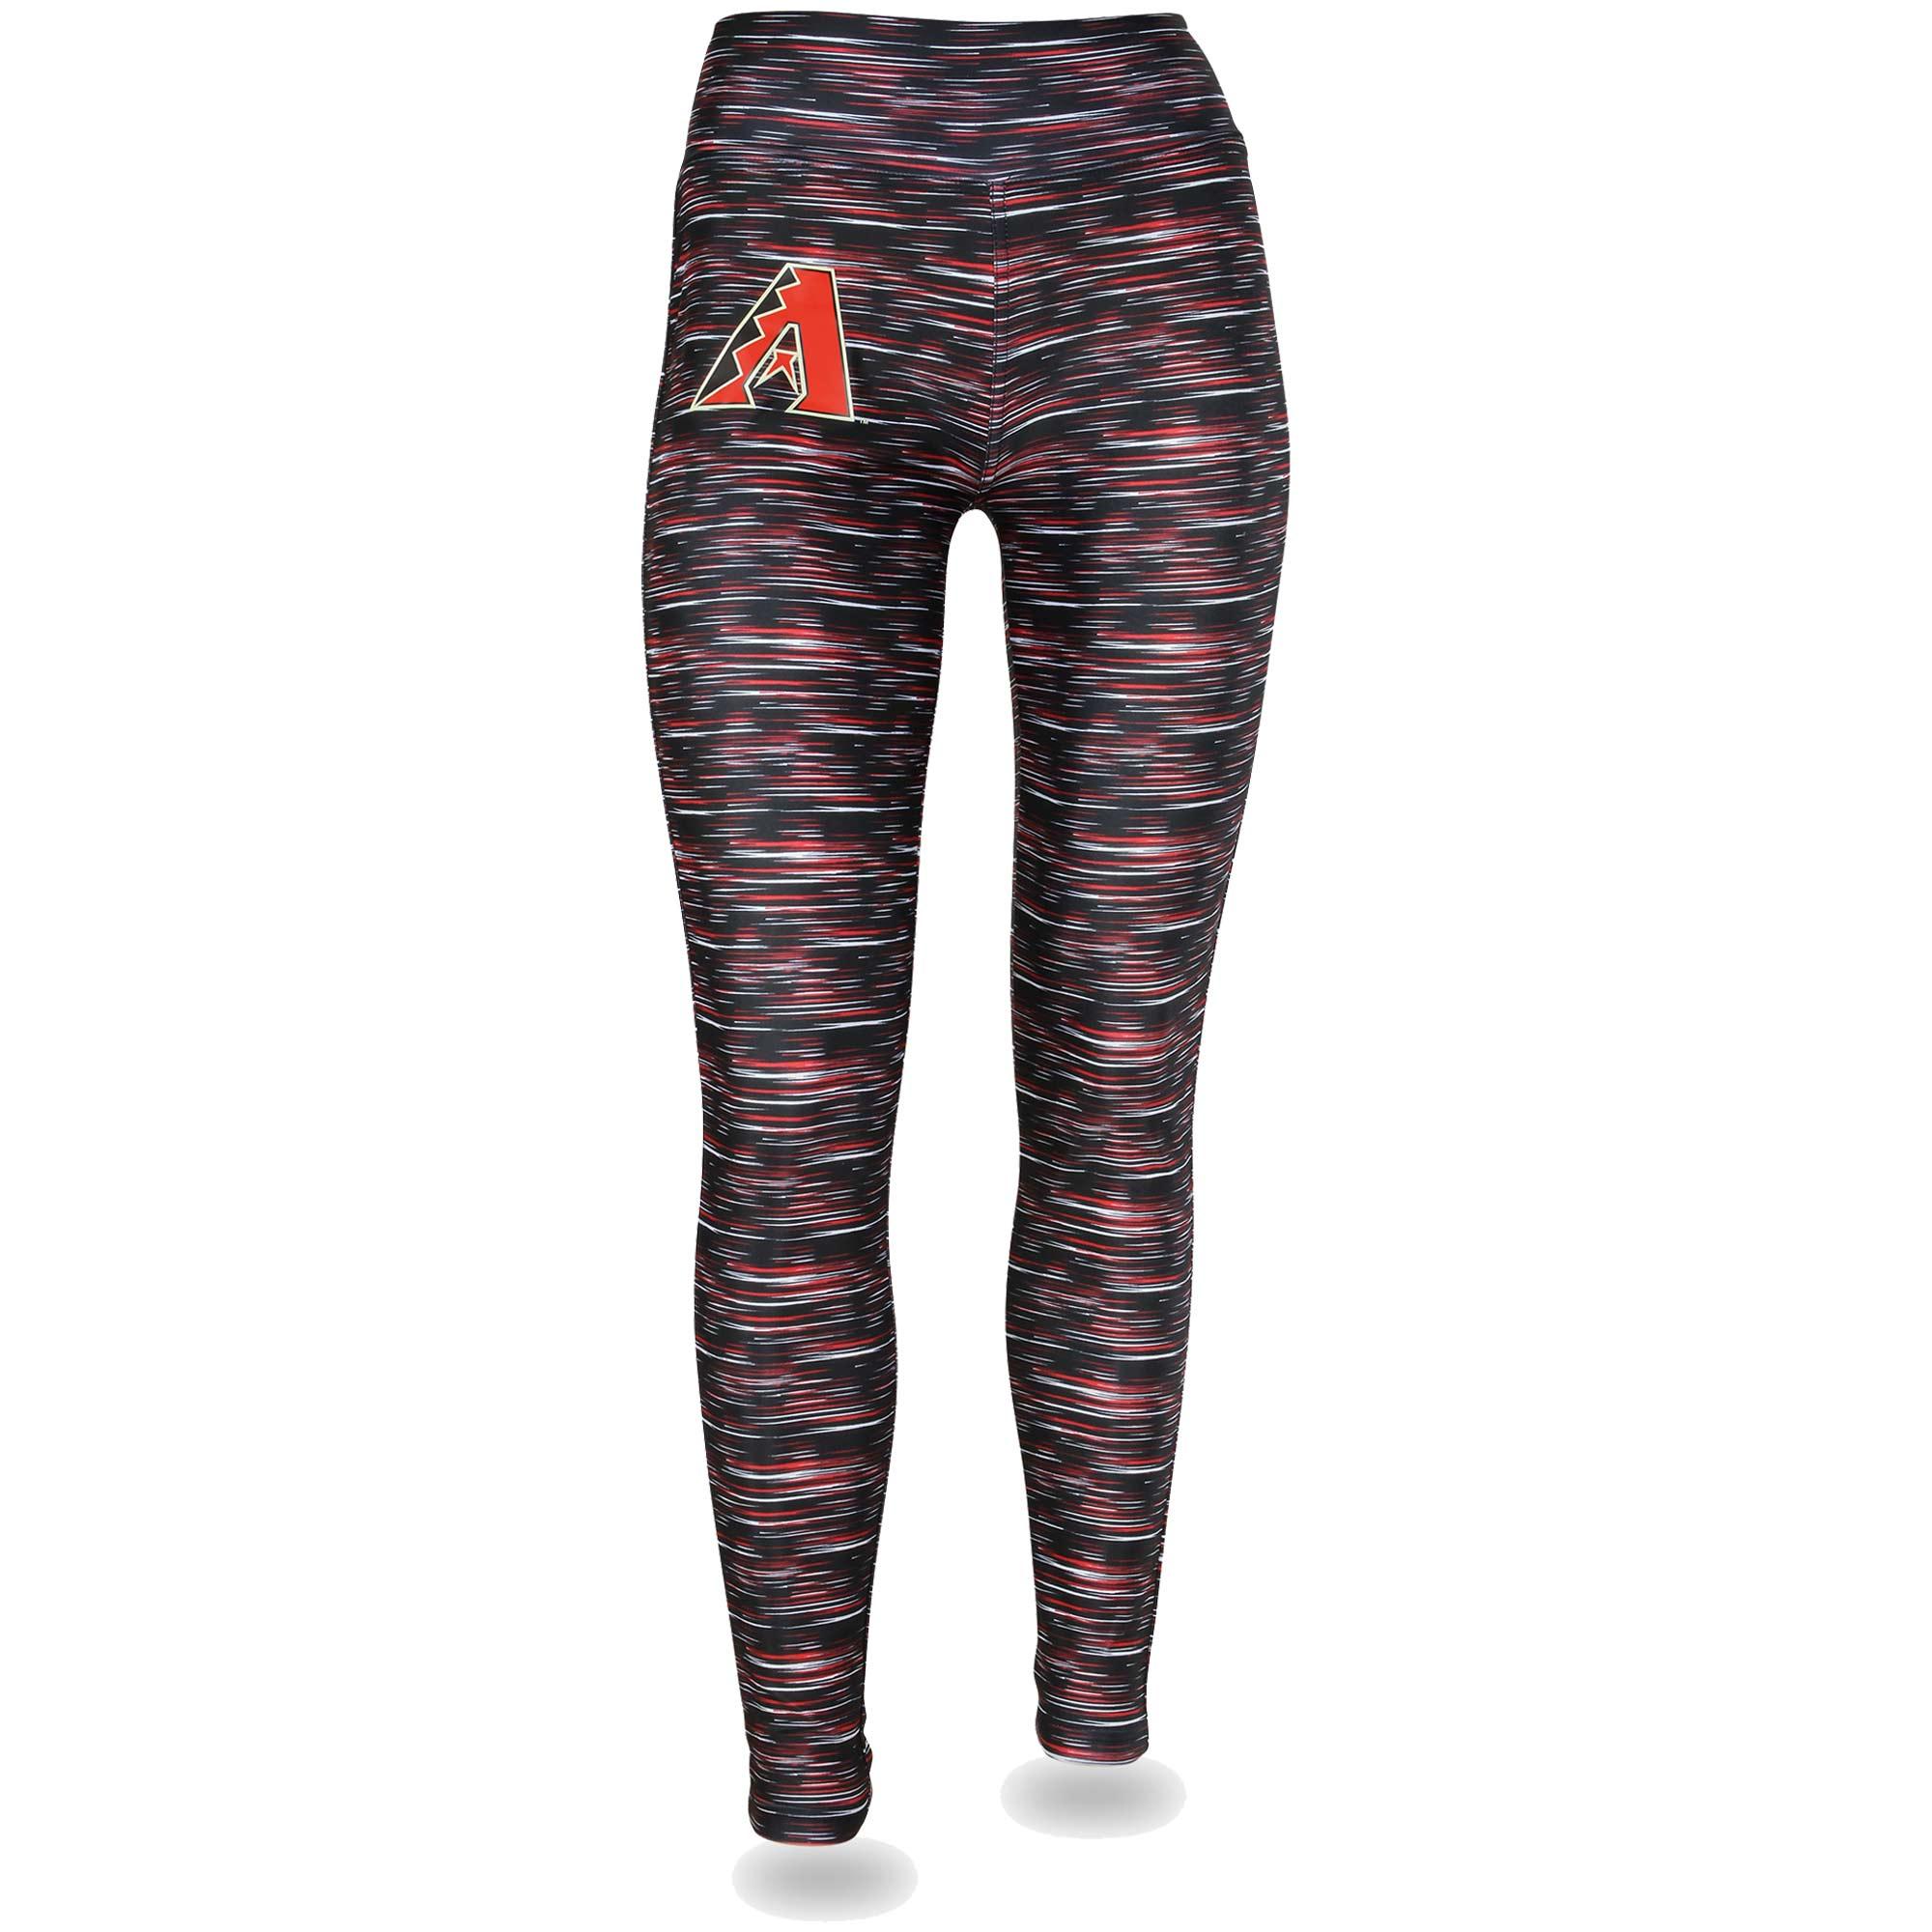 Women's Black/Red Arizona Diamondbacks Space Dye Leggings